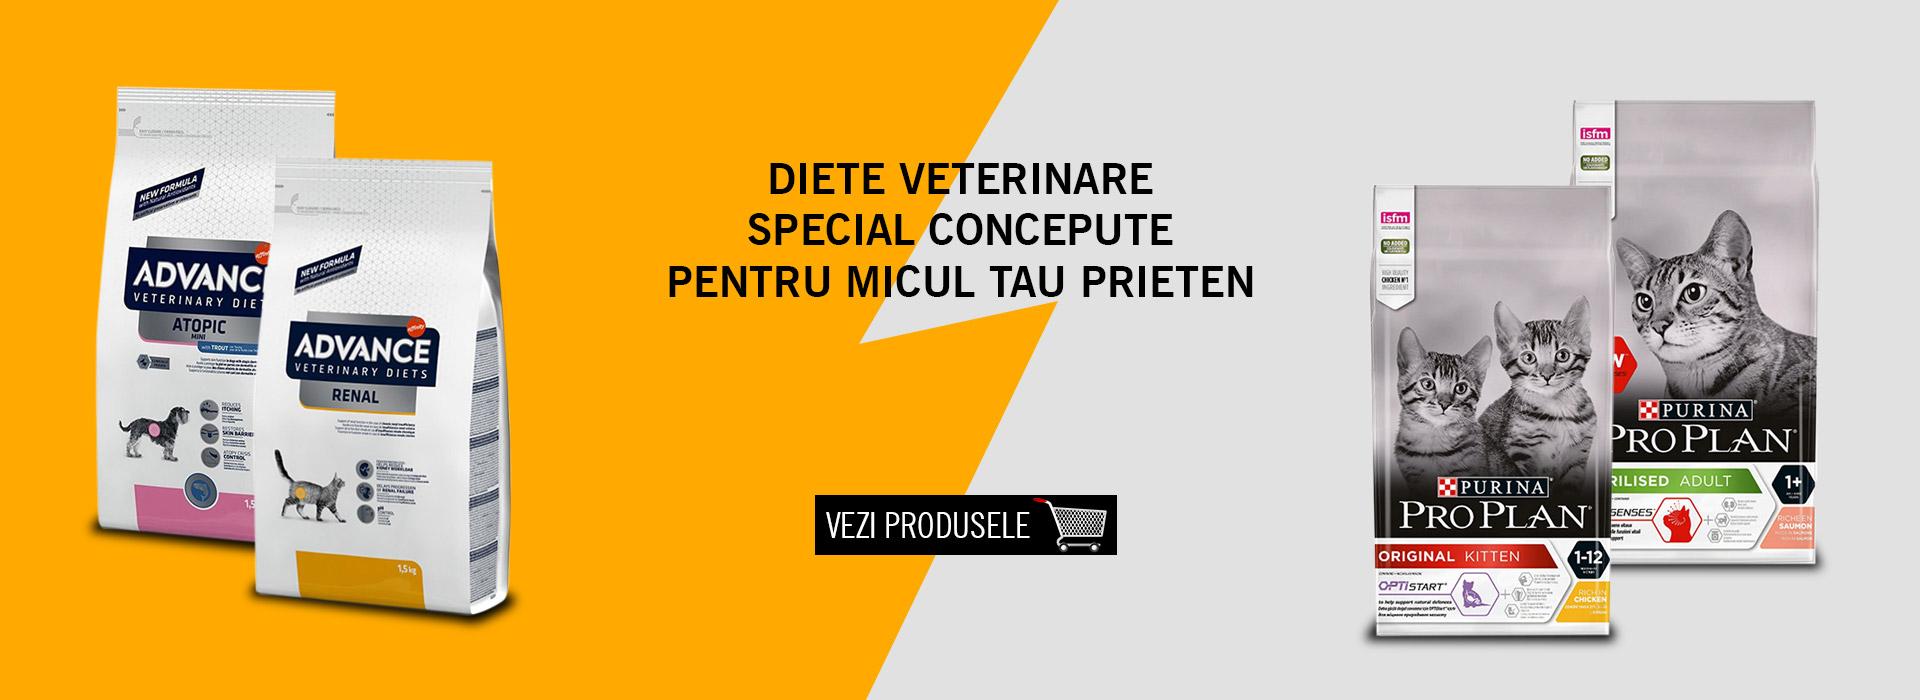 Diete veterinare FarmaciaVet